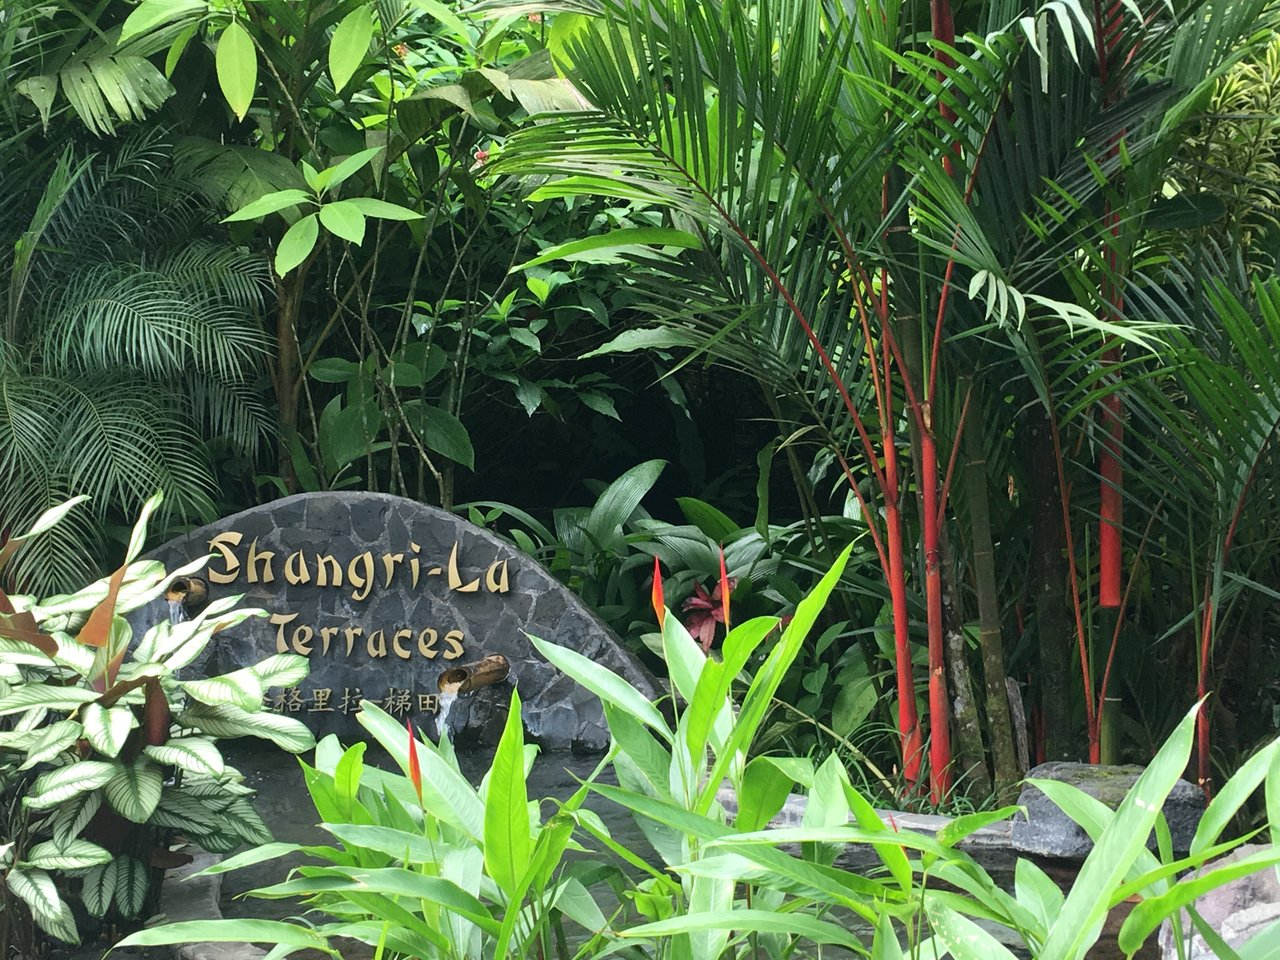 Shangri La Gardens | Photo taken by Rachel H